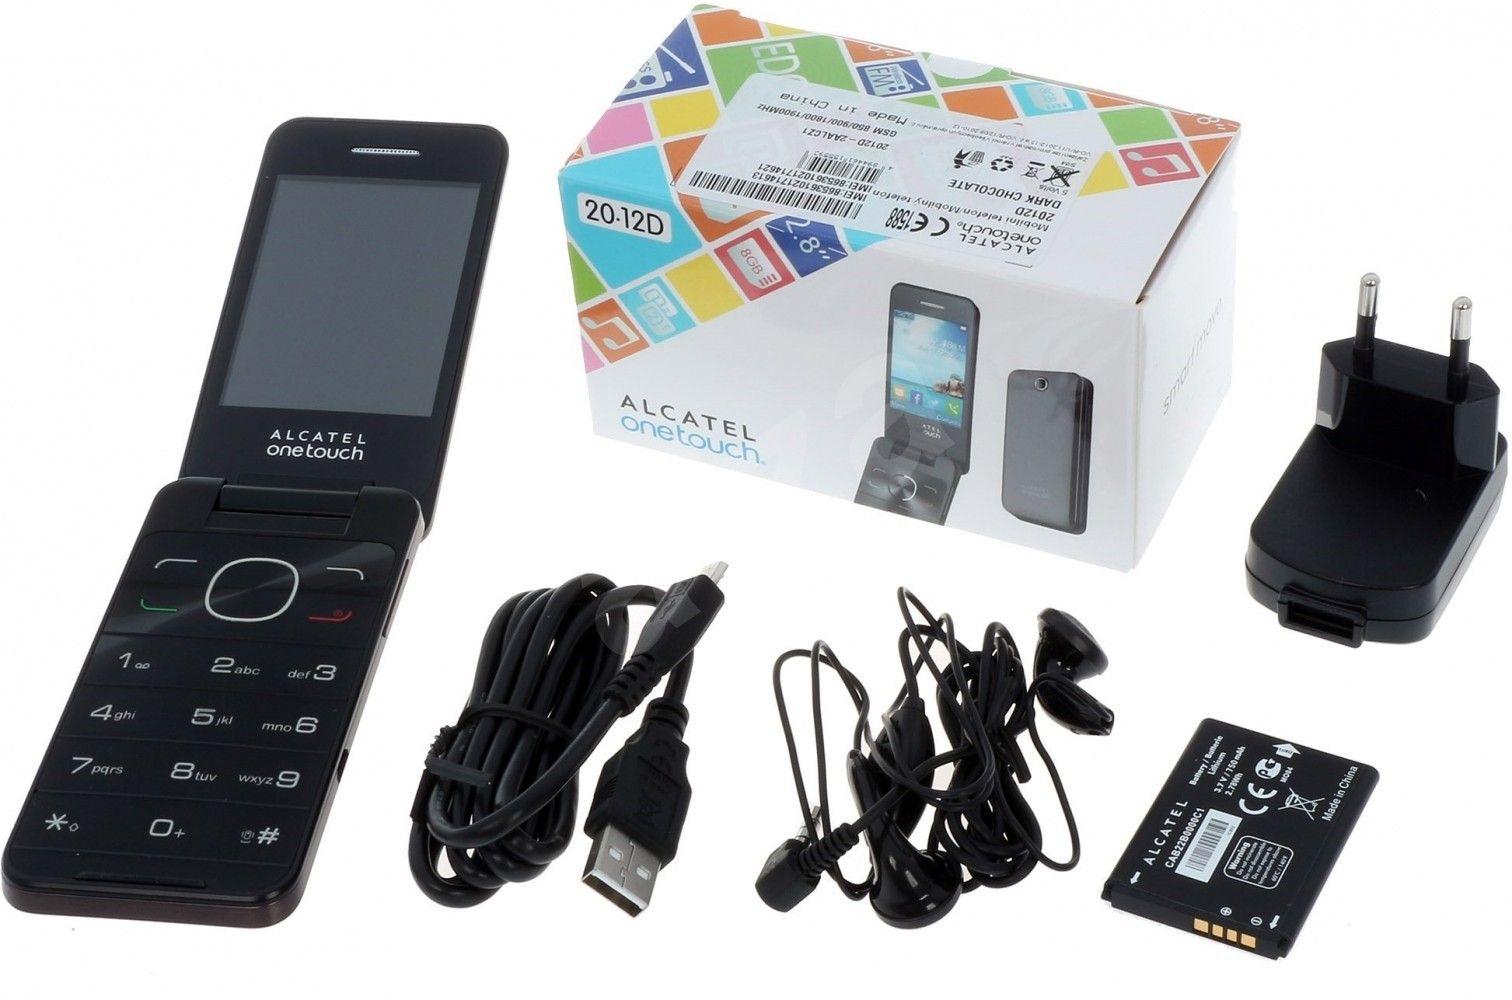 Мобильный телефон Alcatel One Touch 2012D Dark Chocolate - 4